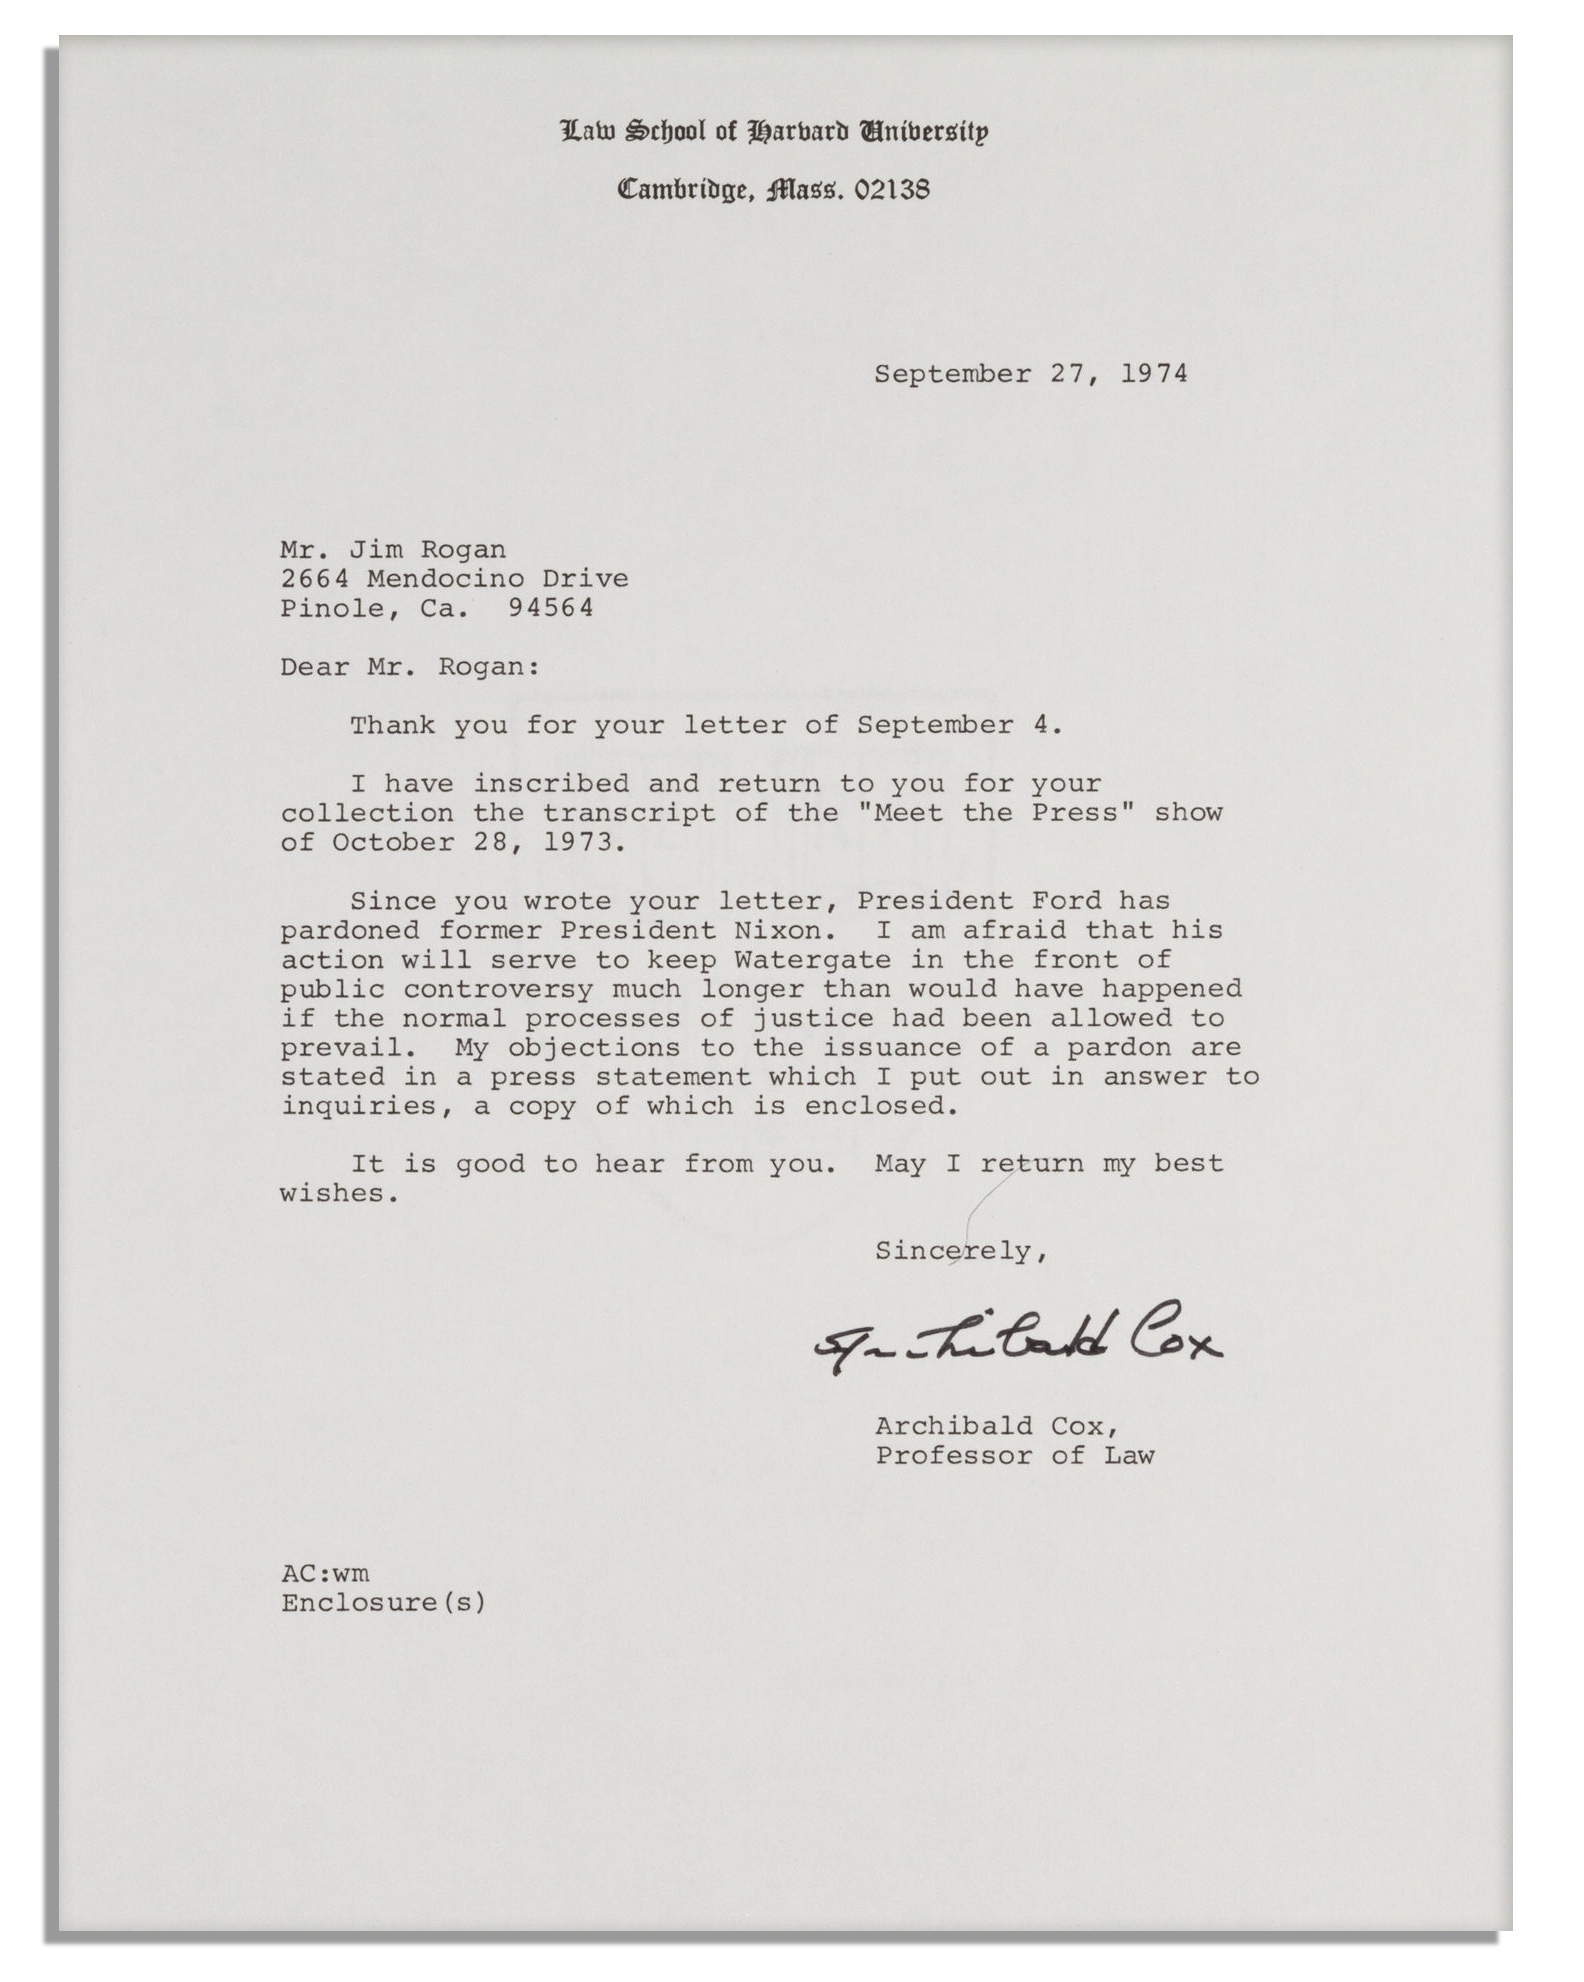 Nixon Resignation Letter - Windenergyinvesting.com